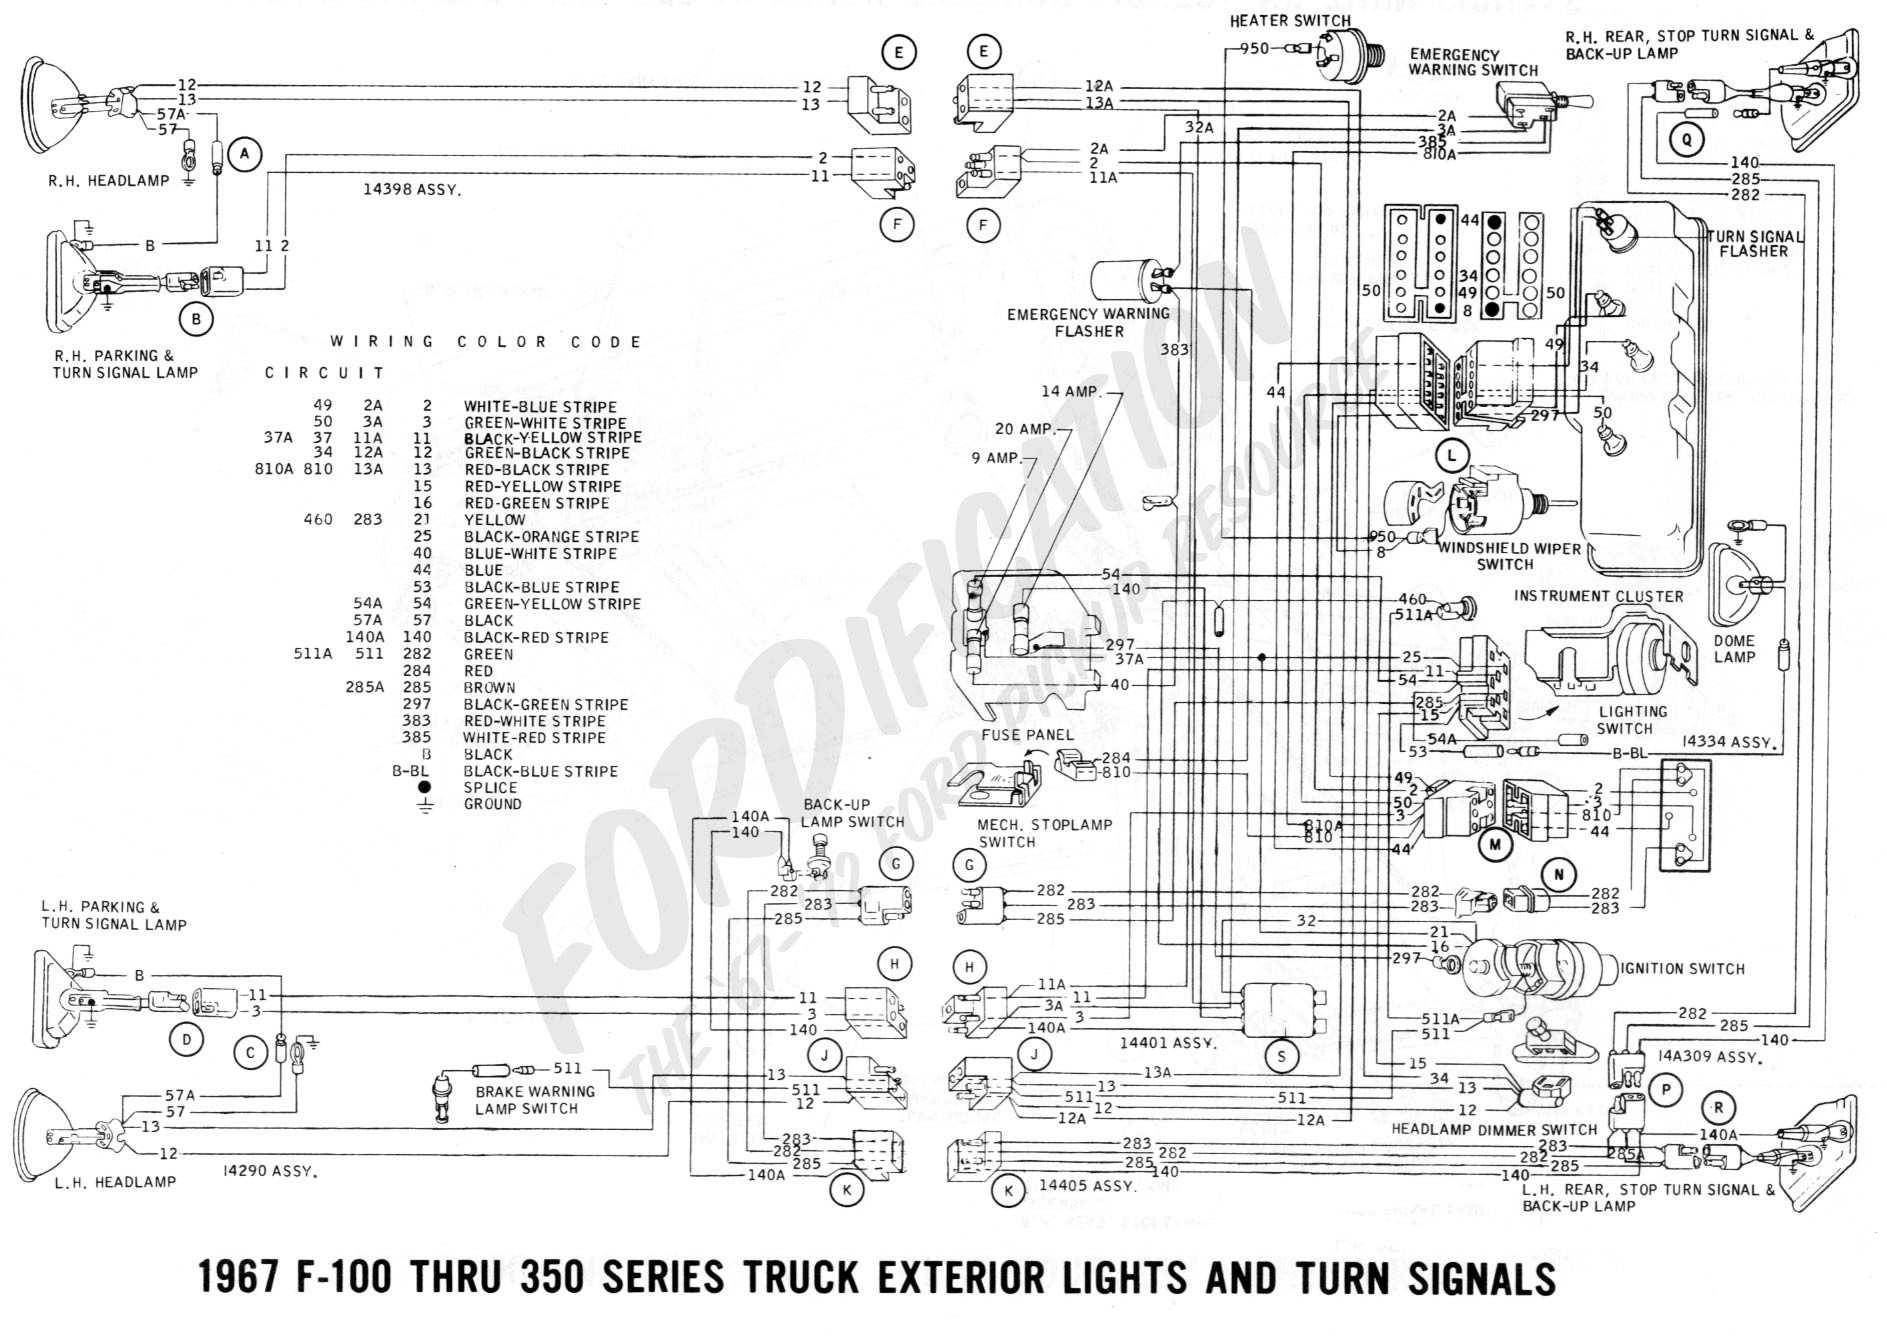 Fisher    Minute Mount 2 Wiring    Diagram      Wiring    Diagram    Image